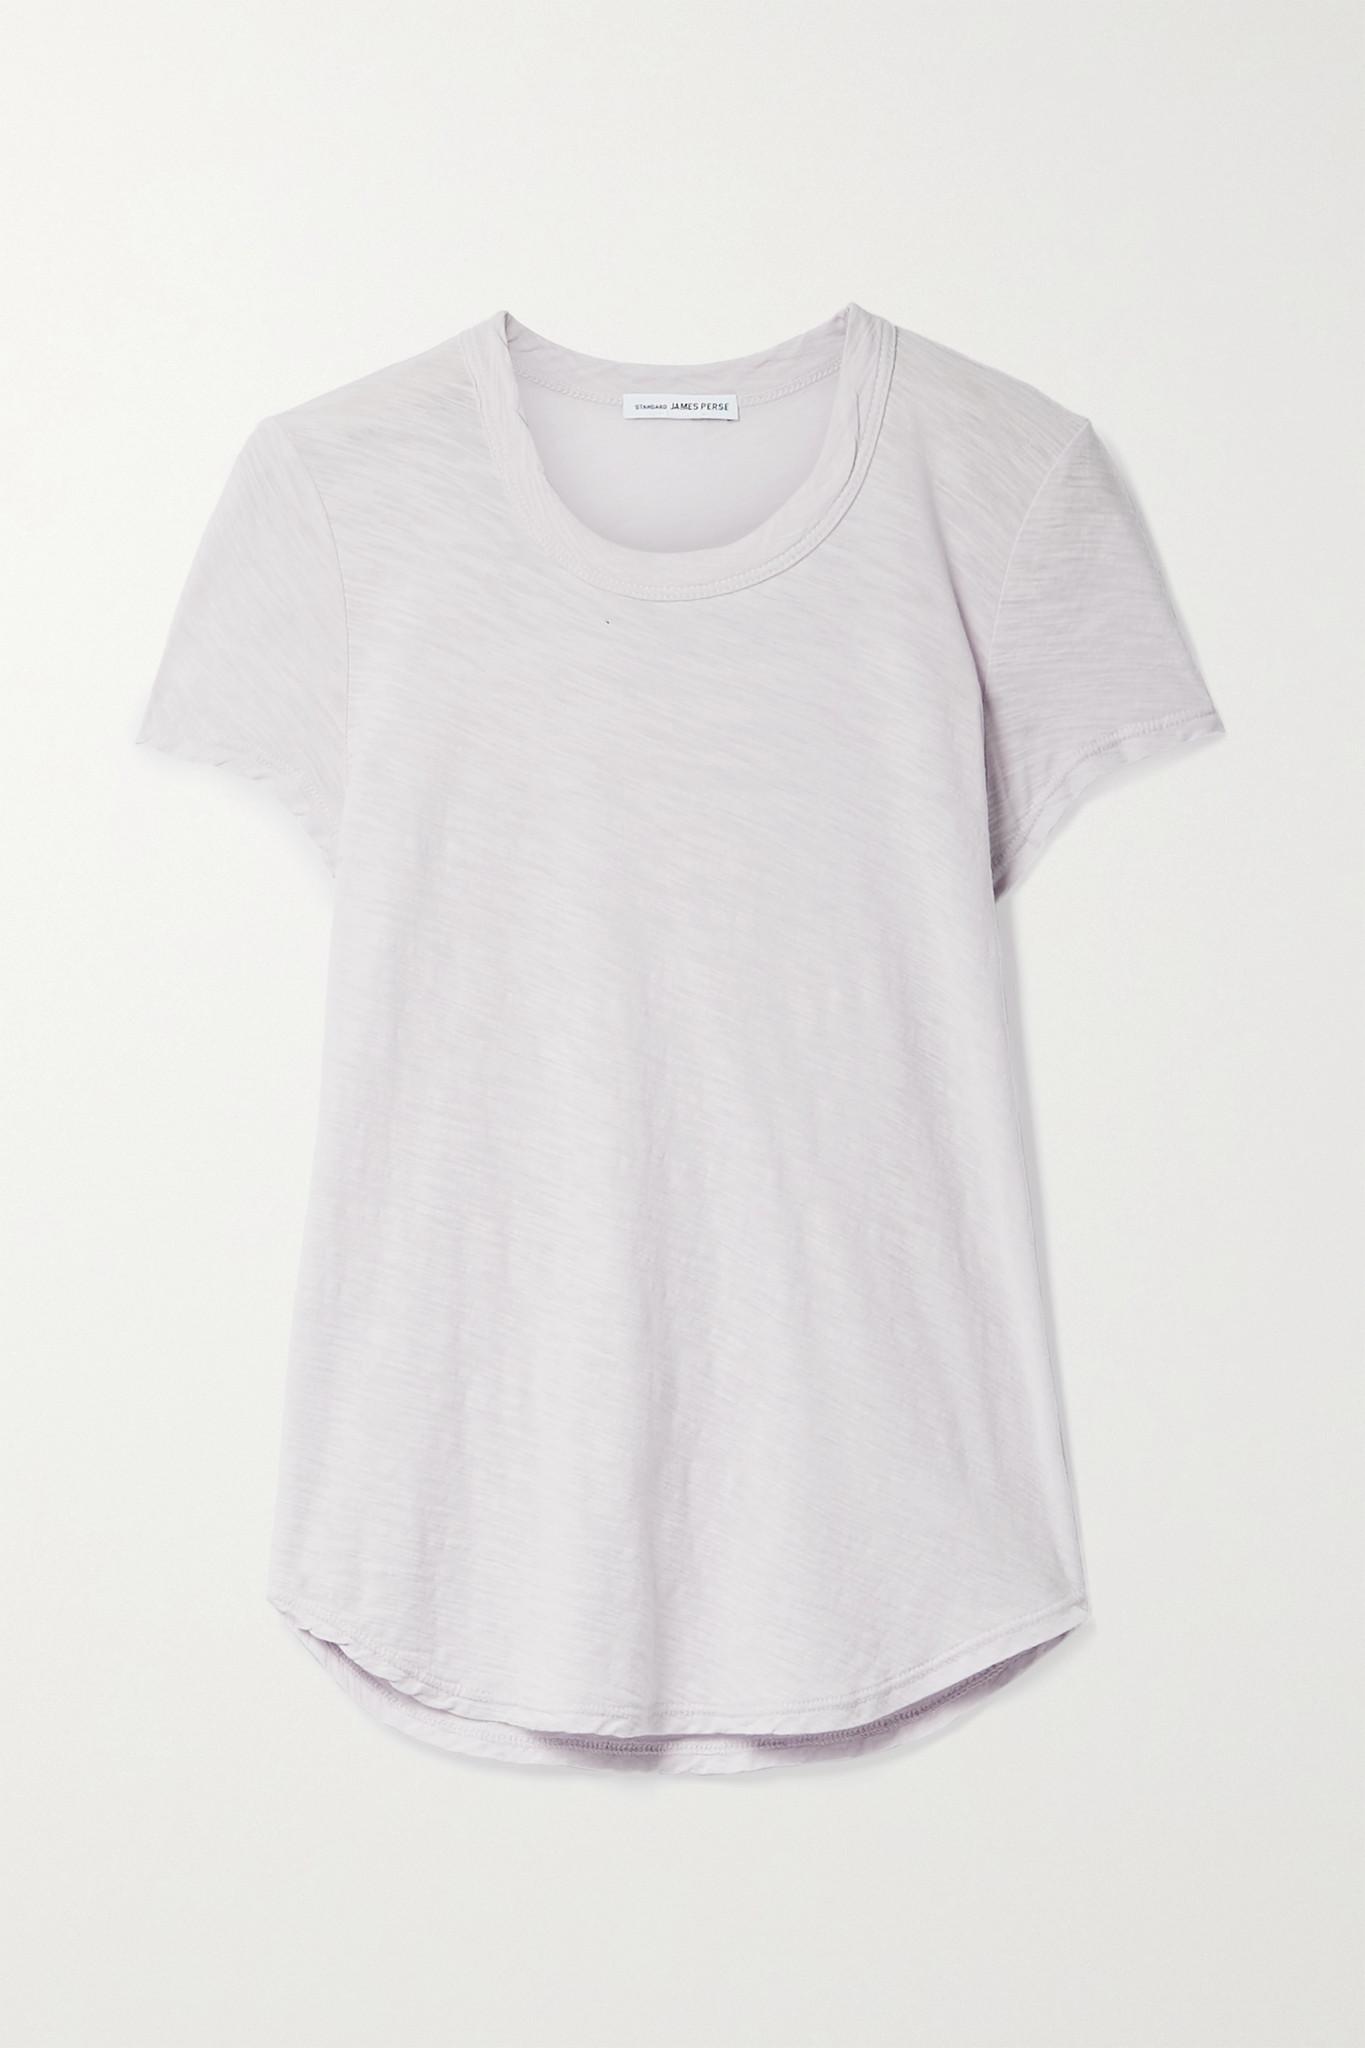 JAMES PERSE - Slub Supima Cotton-jersey T-shirt - Purple - 2